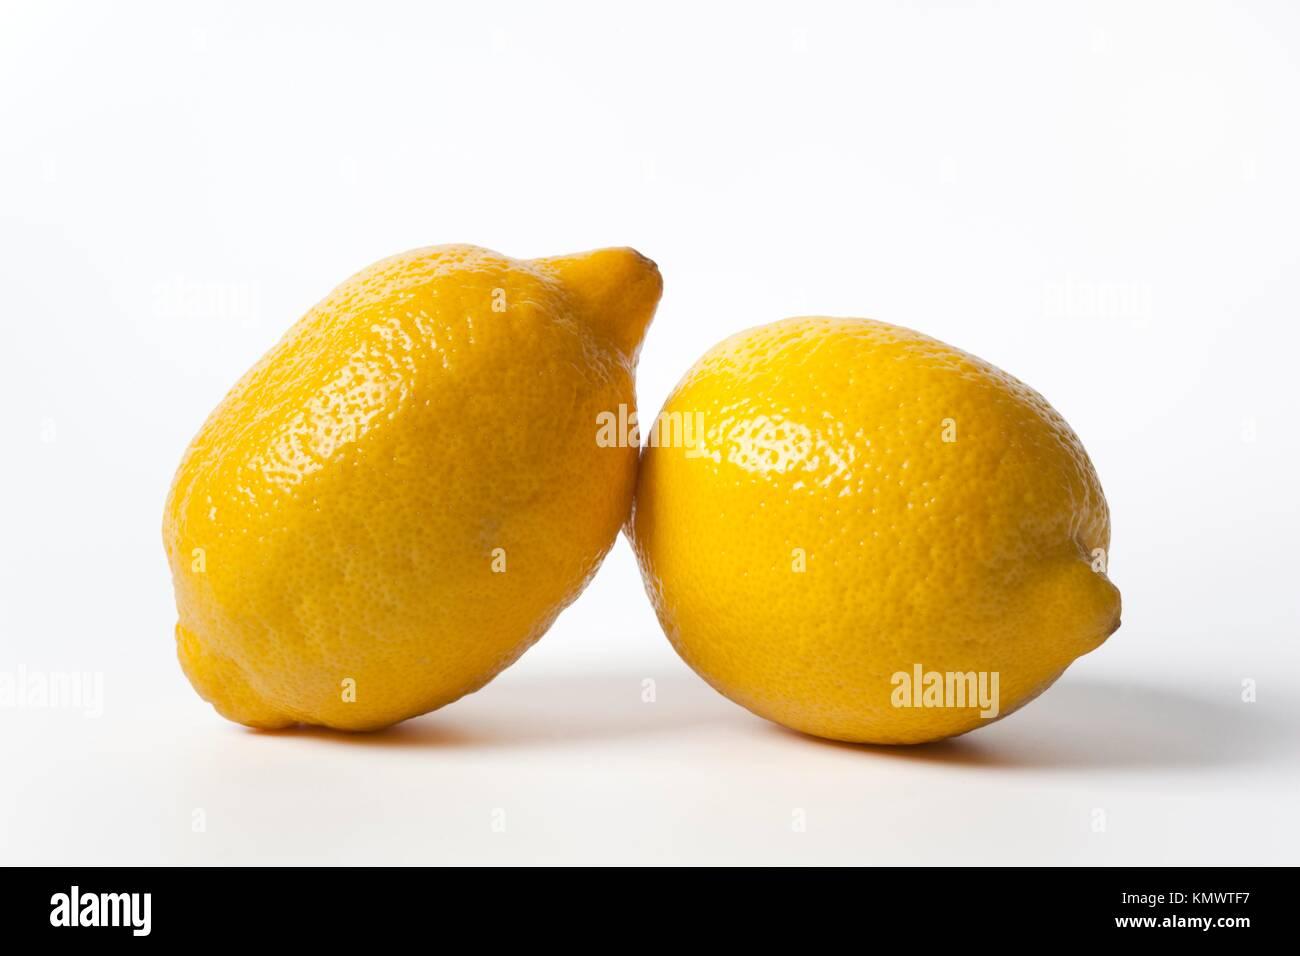 Two whole uncut lemons - Stock Image